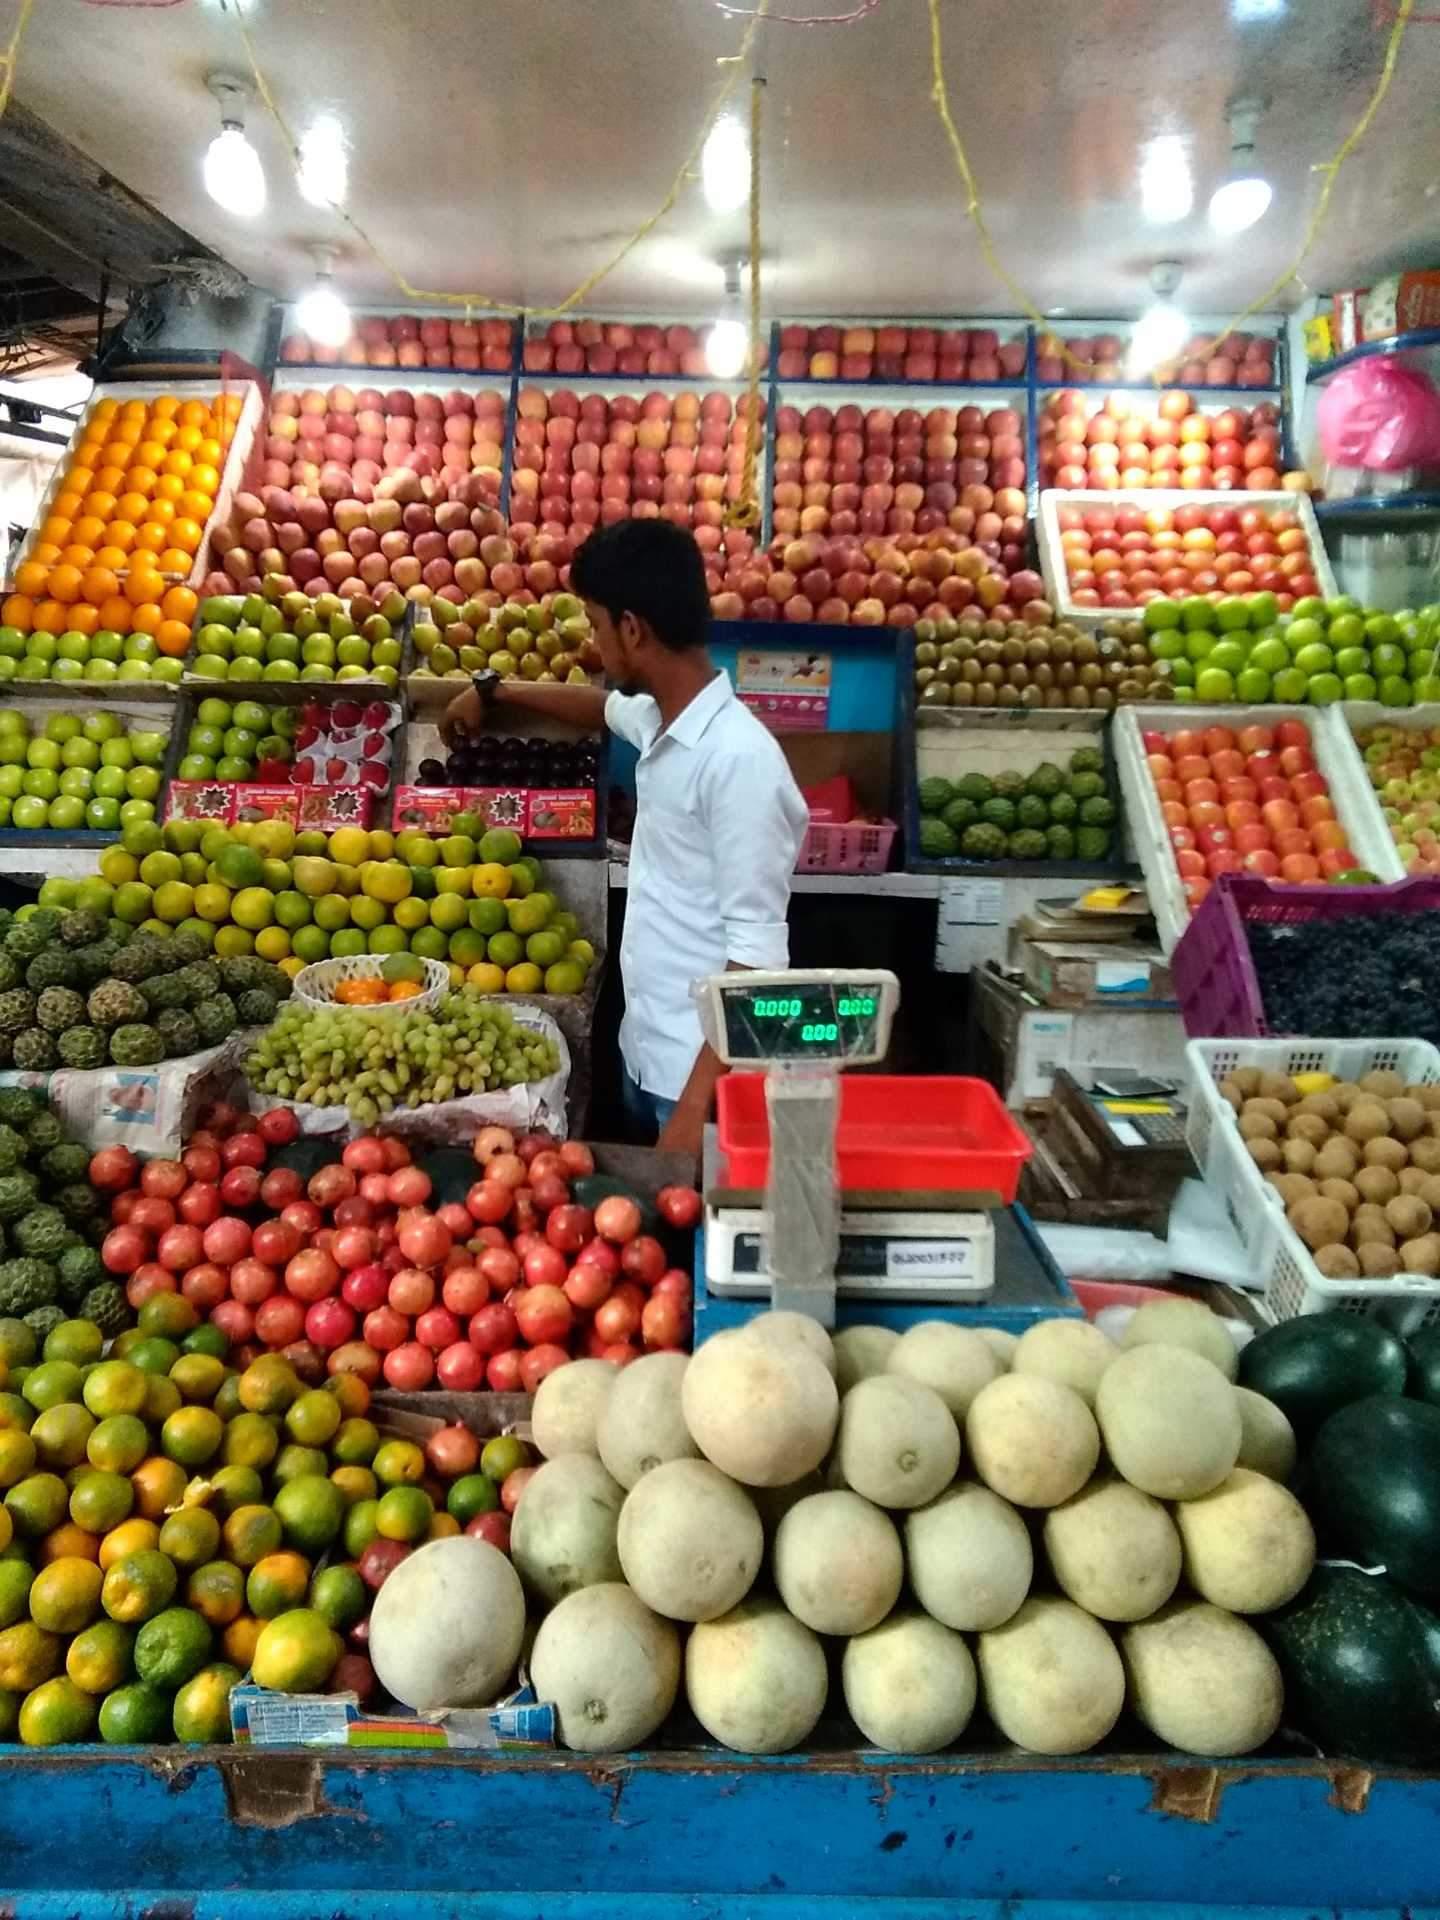 Top 20 Fruit Wholesalers in Moodbidri, Mangalore - Best Fruit